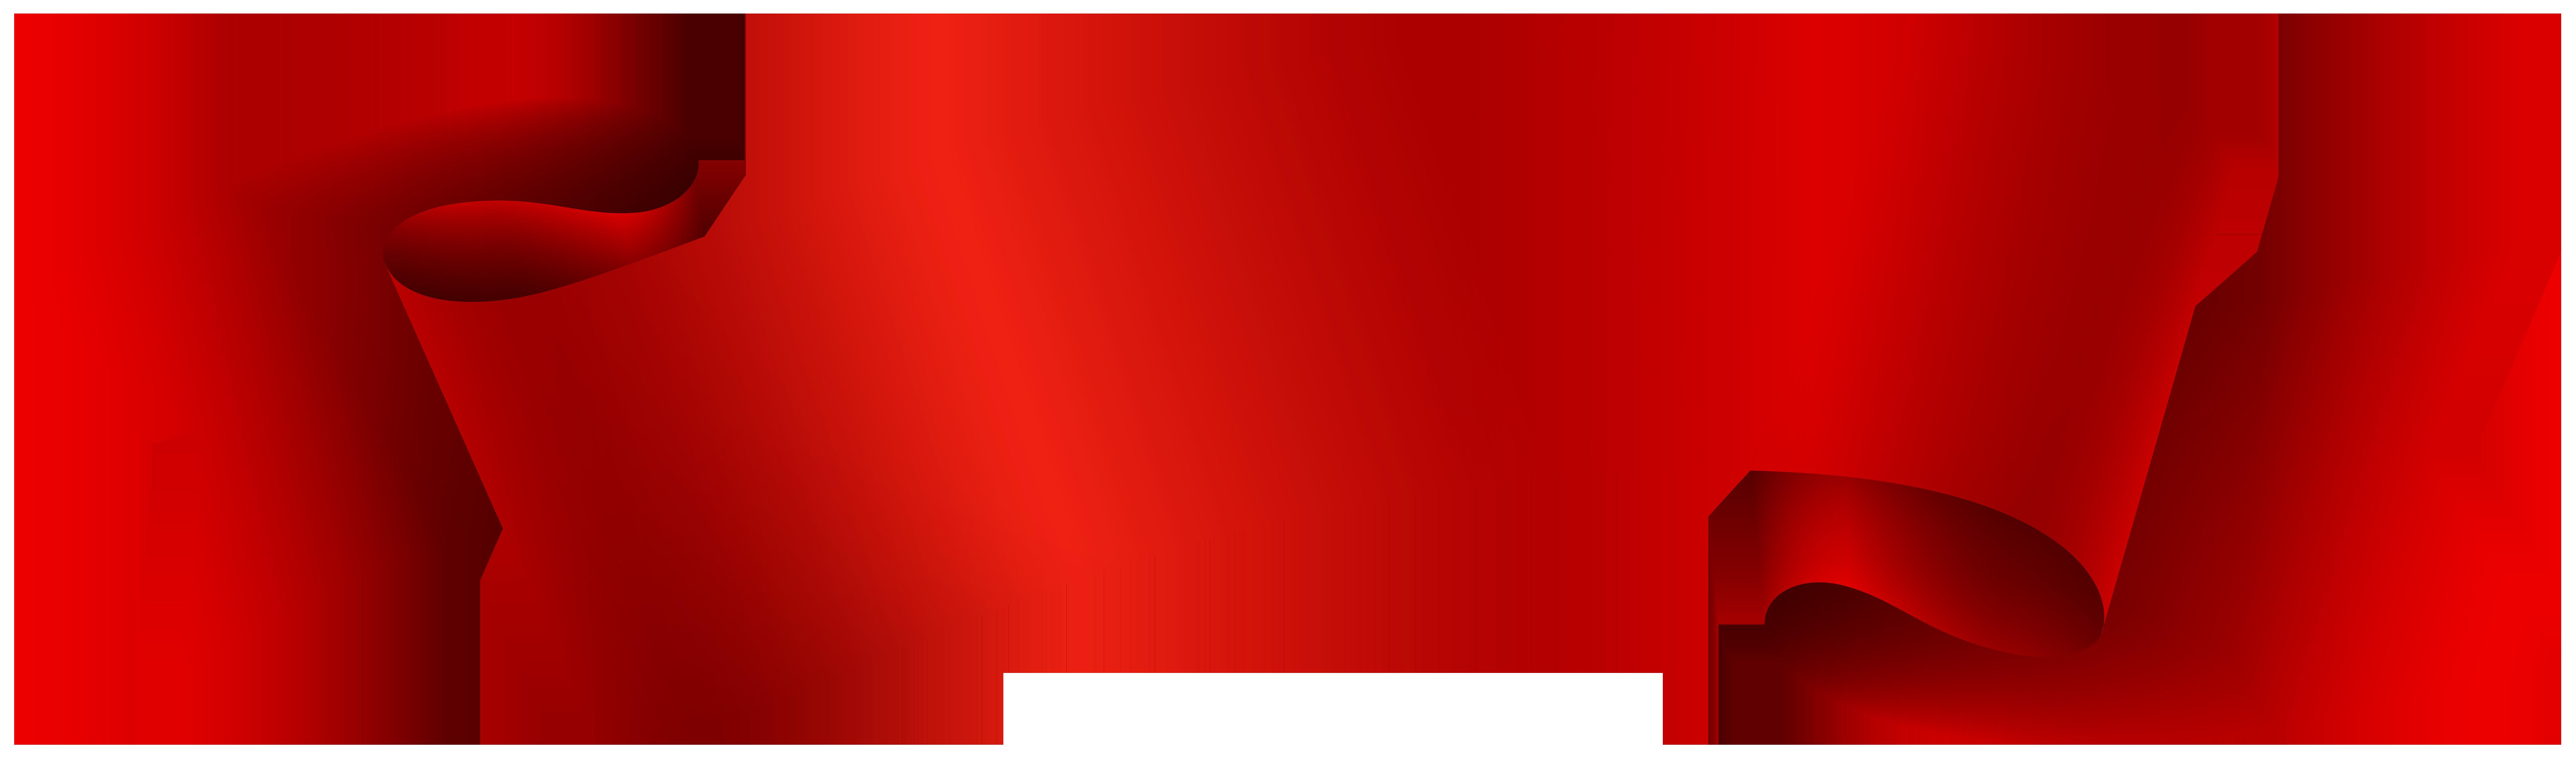 Banner Red Ribbon Clip art.